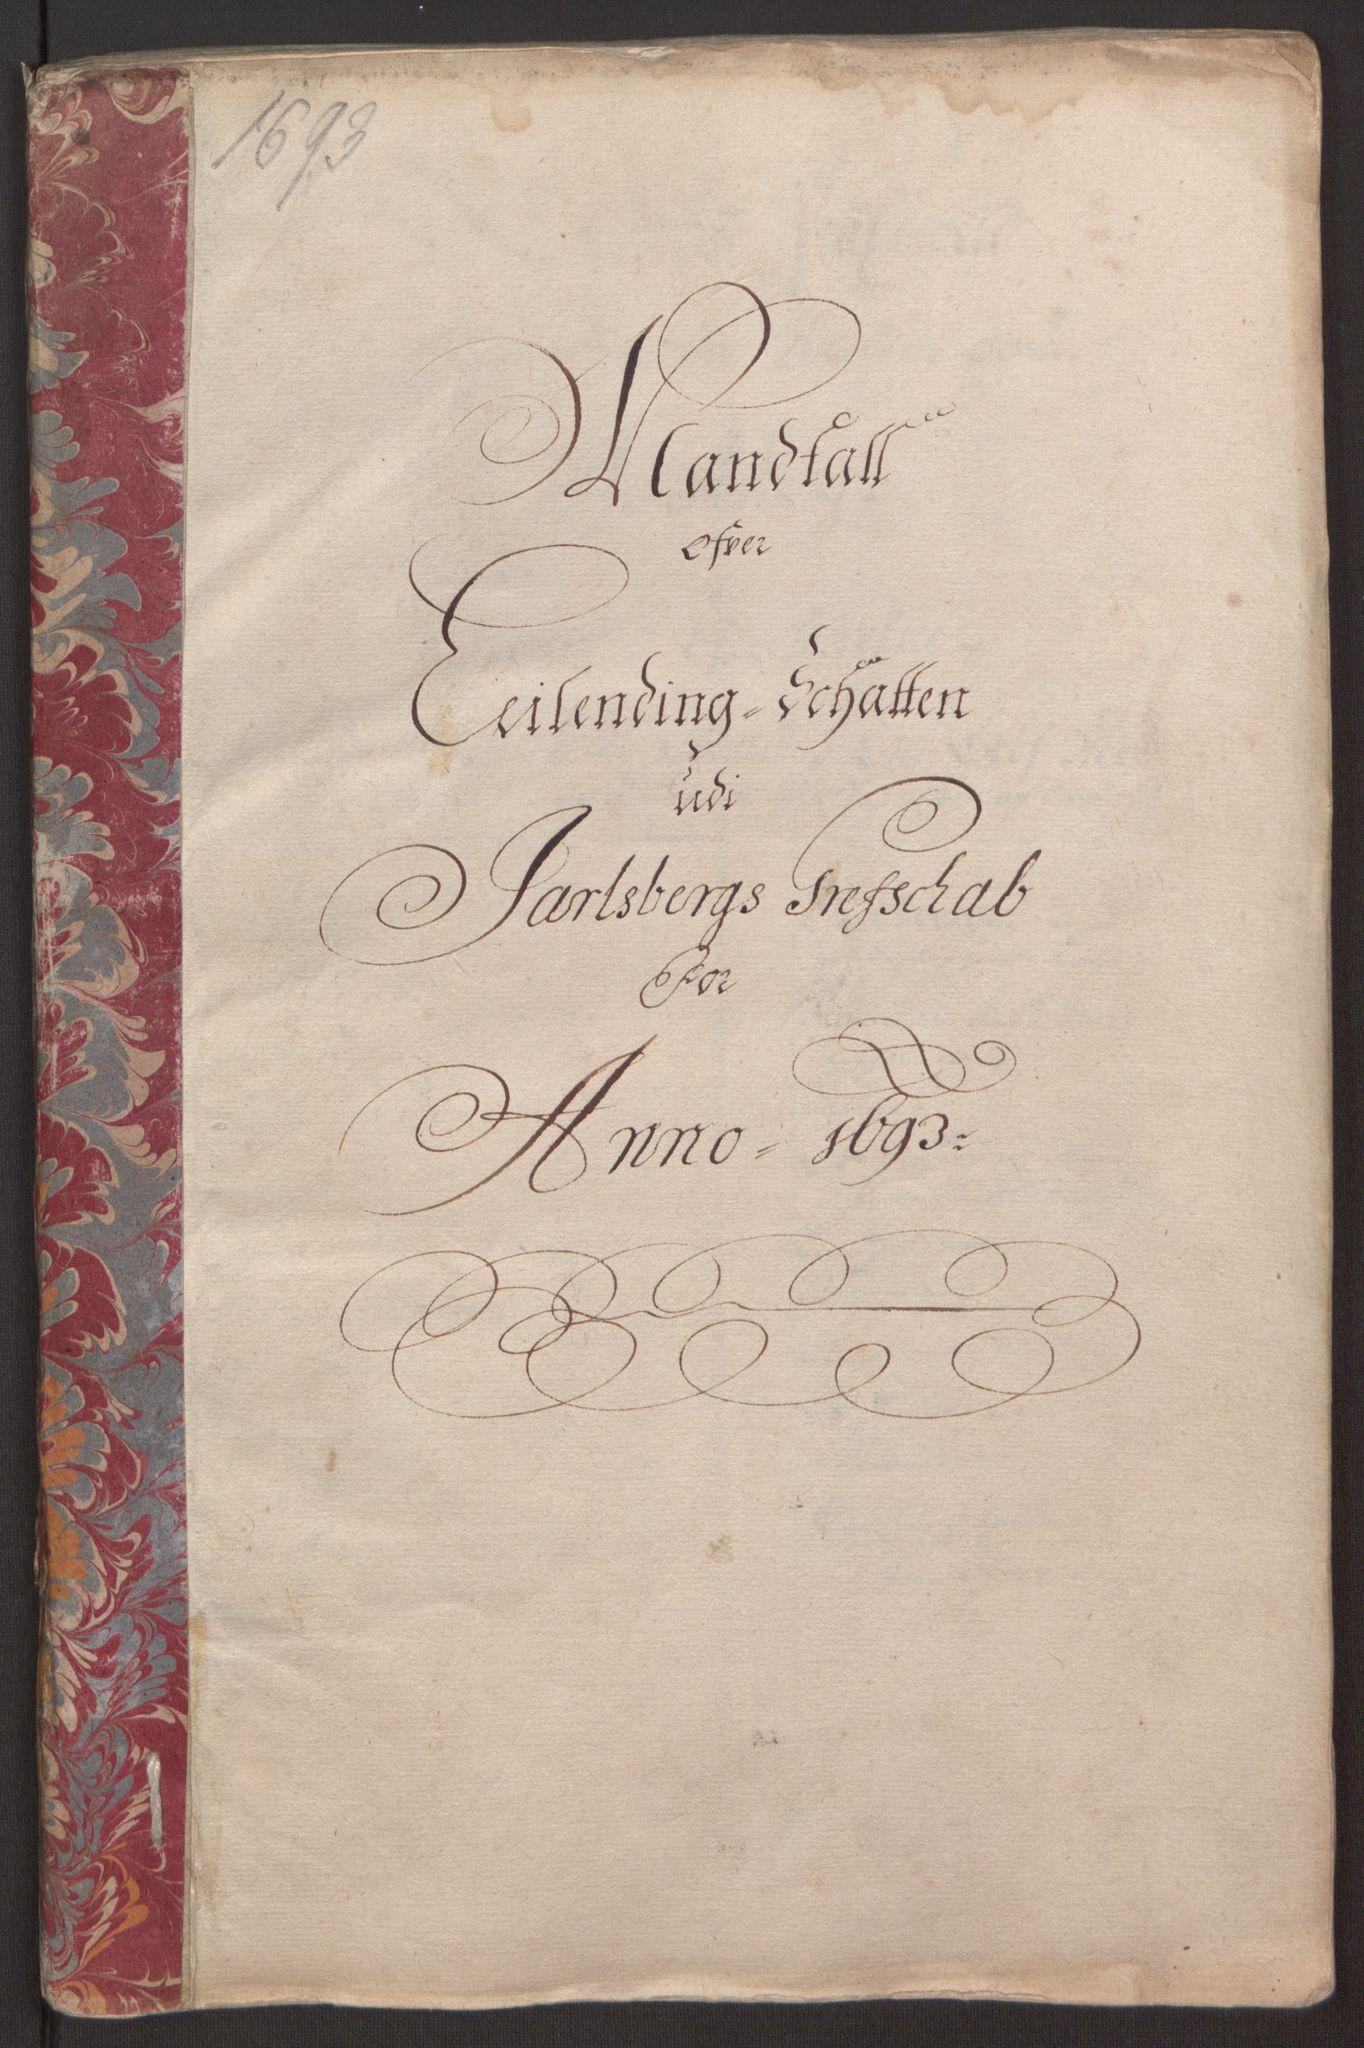 RA, Rentekammeret inntil 1814, Reviderte regnskaper, Fogderegnskap, R32/L1866: Fogderegnskap Jarlsberg grevskap, 1693, s. 29